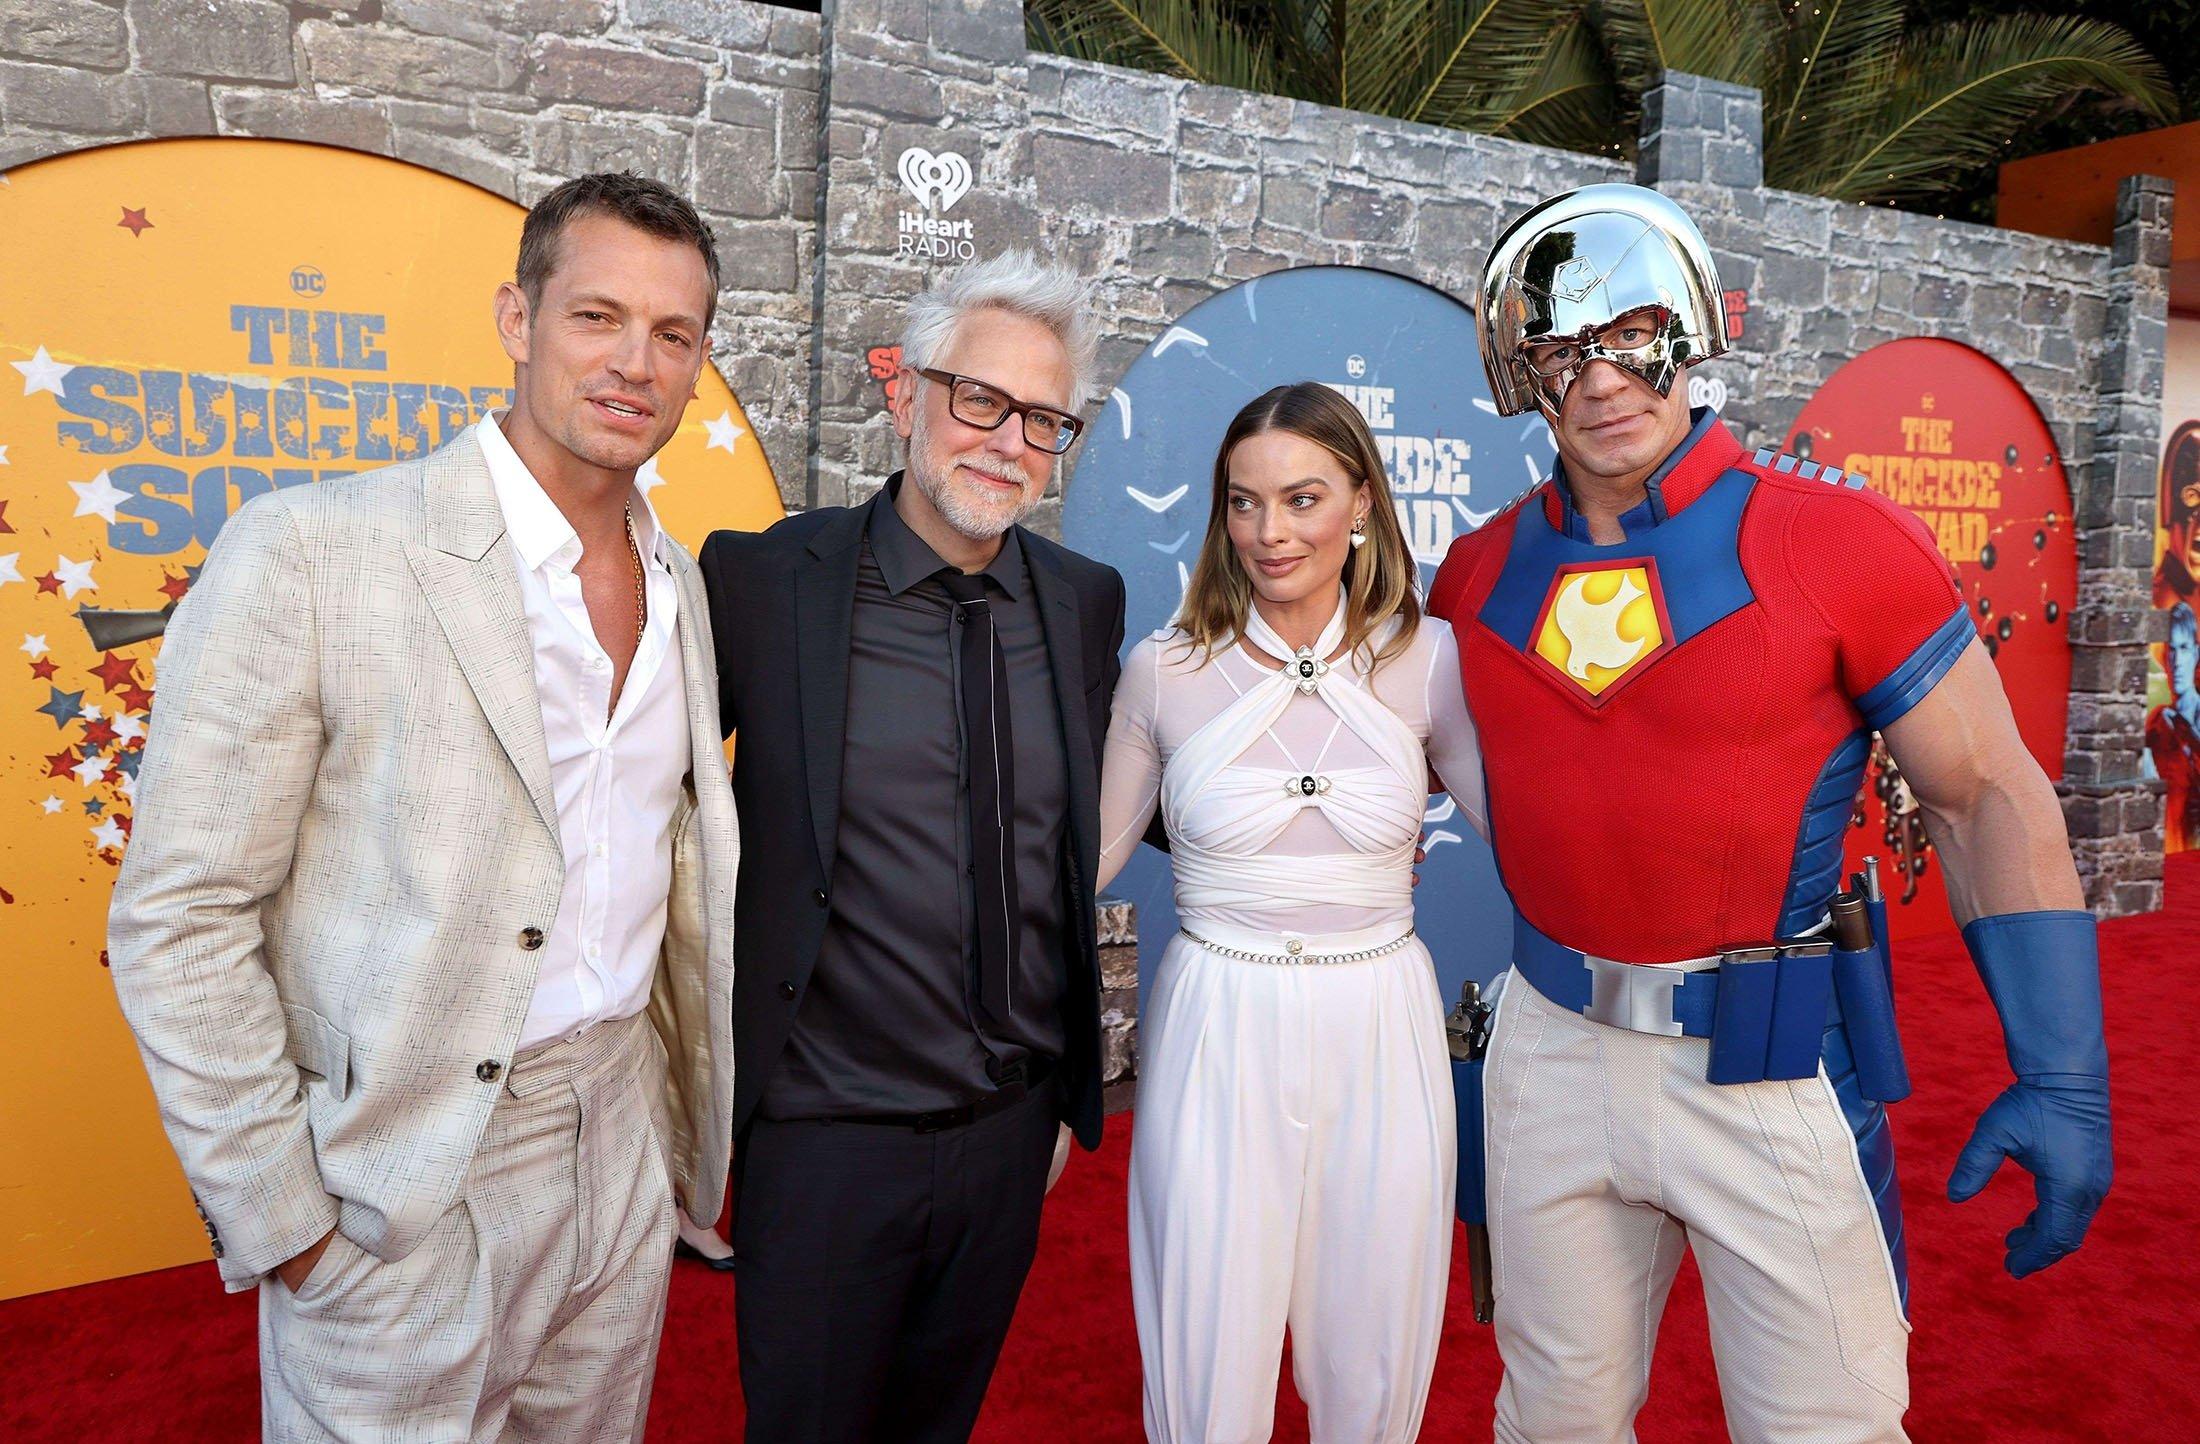 Joel Kinnaman (L), James Gunn (C-L), Margot Robbie (C-R), and John Cena attend the Warner Bros. premiere of 'The Suicide Squad' at Regency Village Theatre in Los Angeles, California, U.S., Aug. 2, 2021. (AFP Photo)